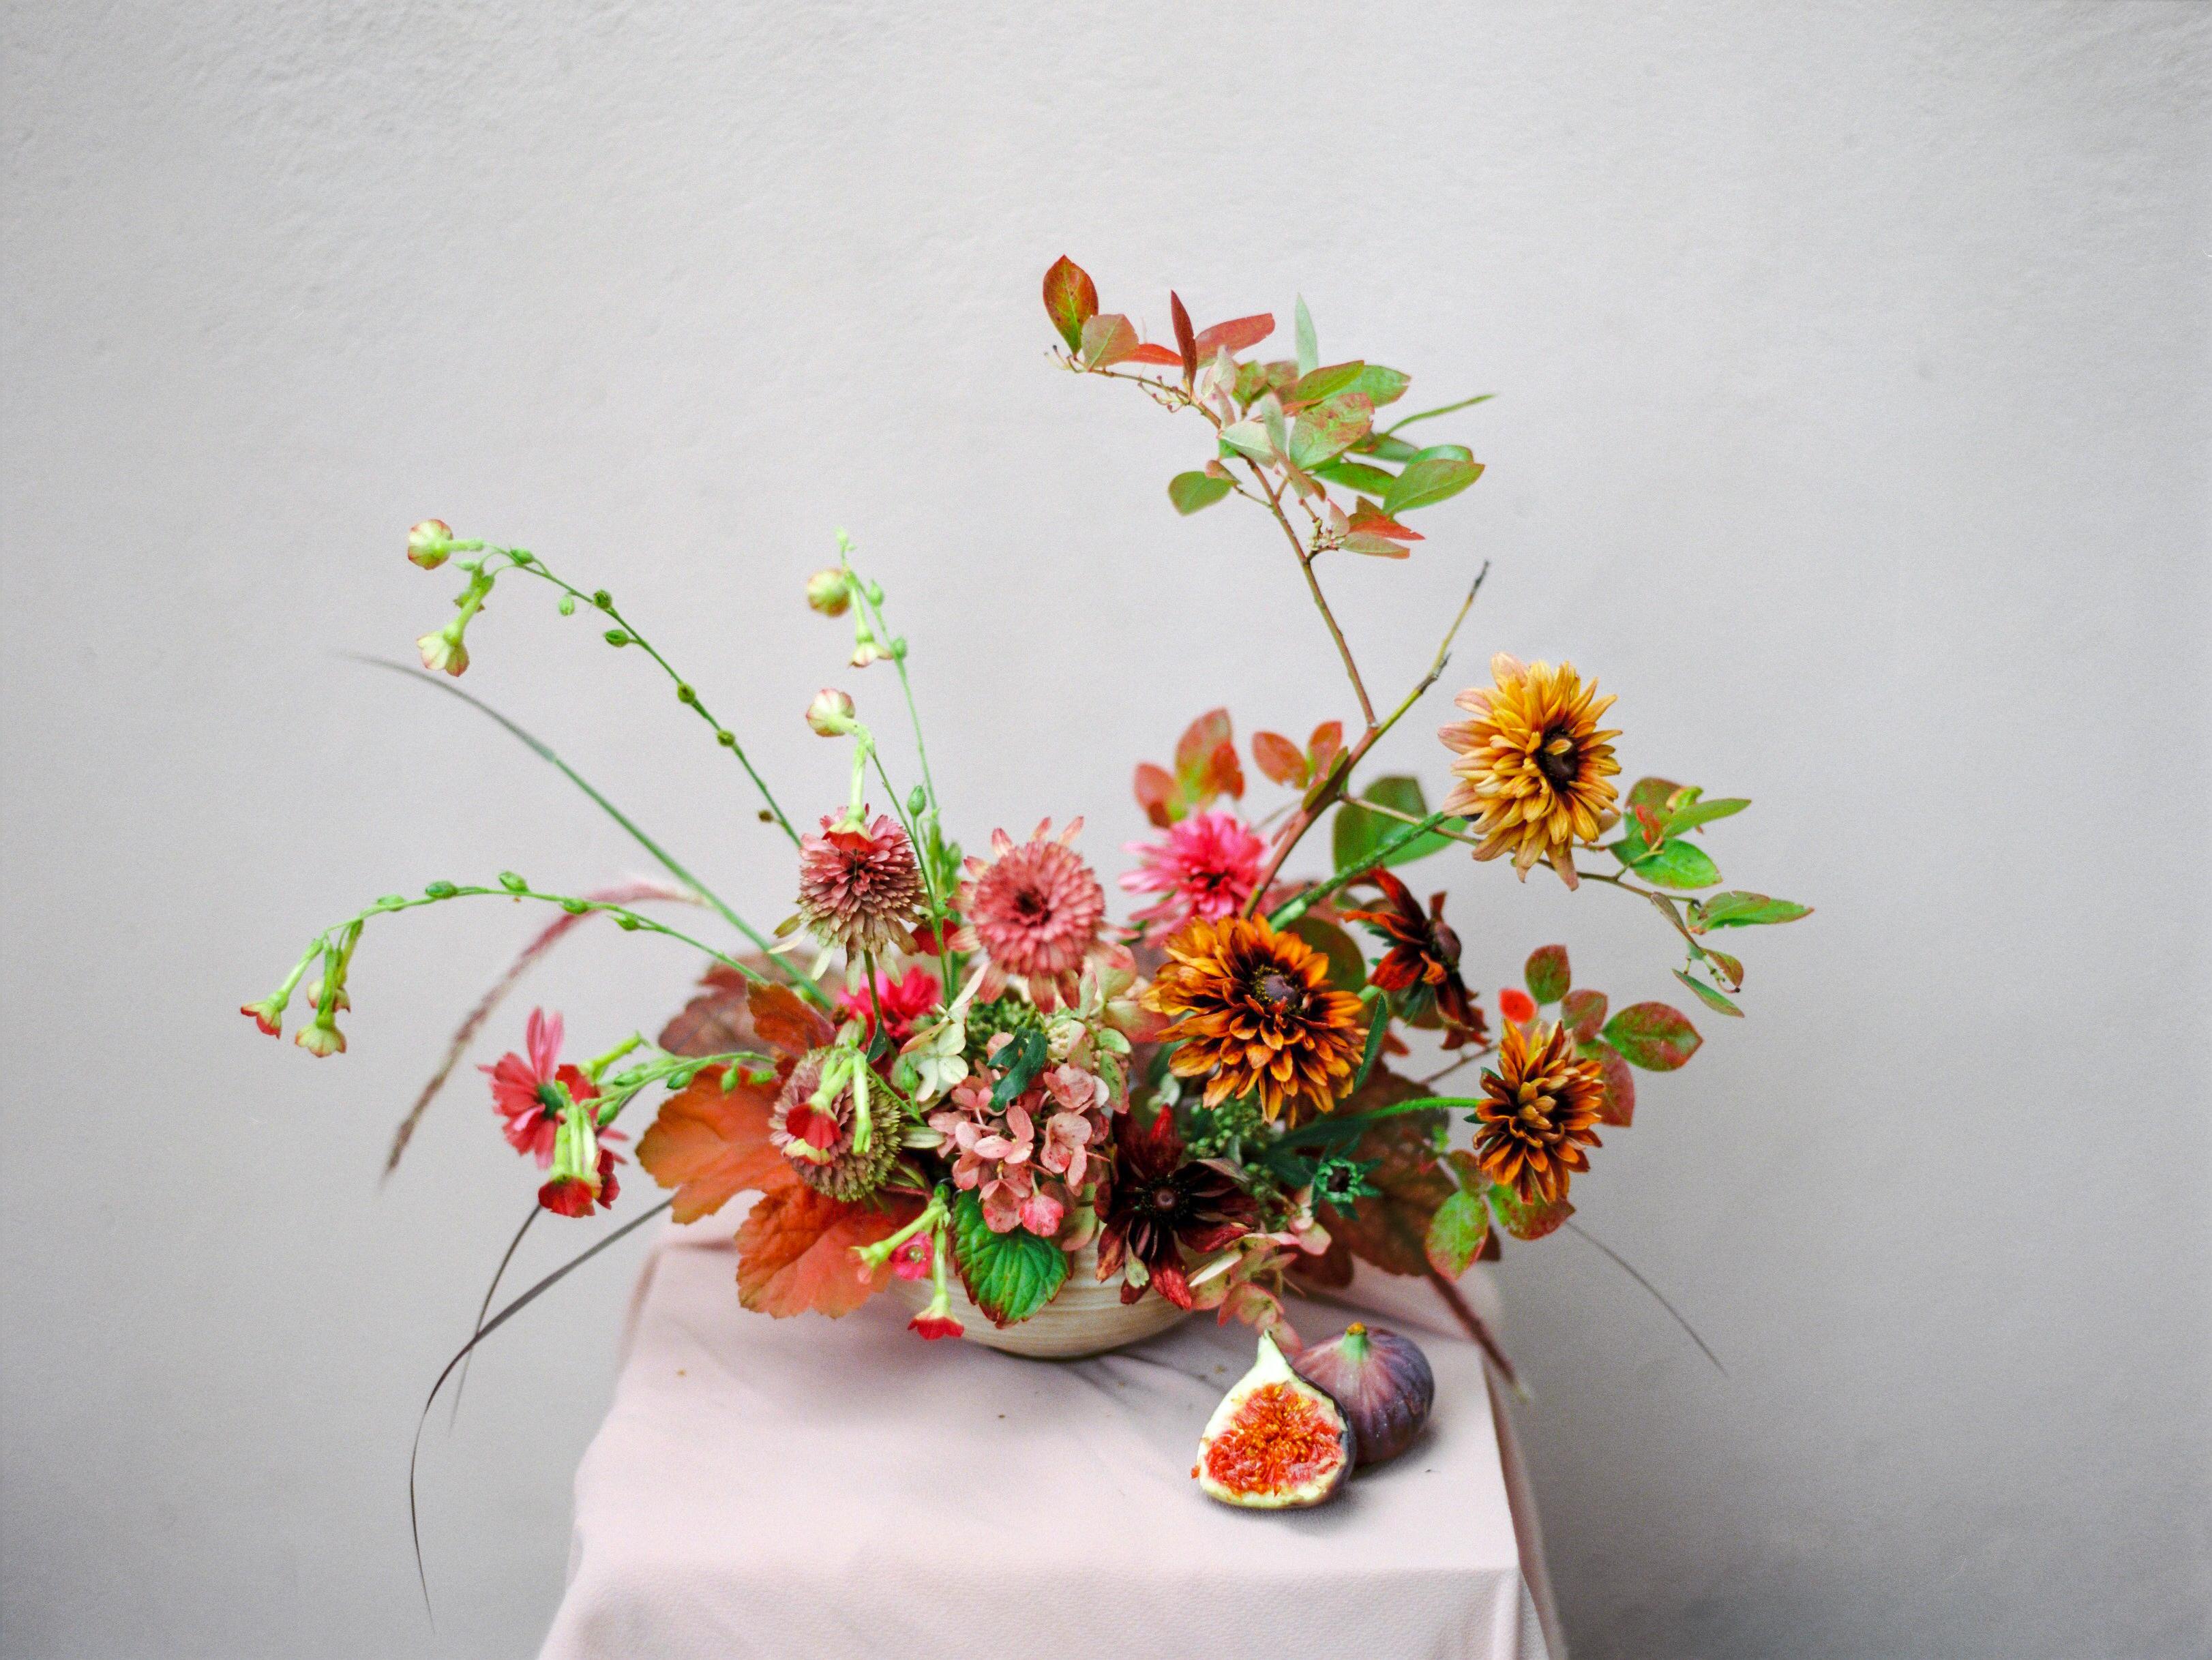 florystyka zero waste, śluby zero waste